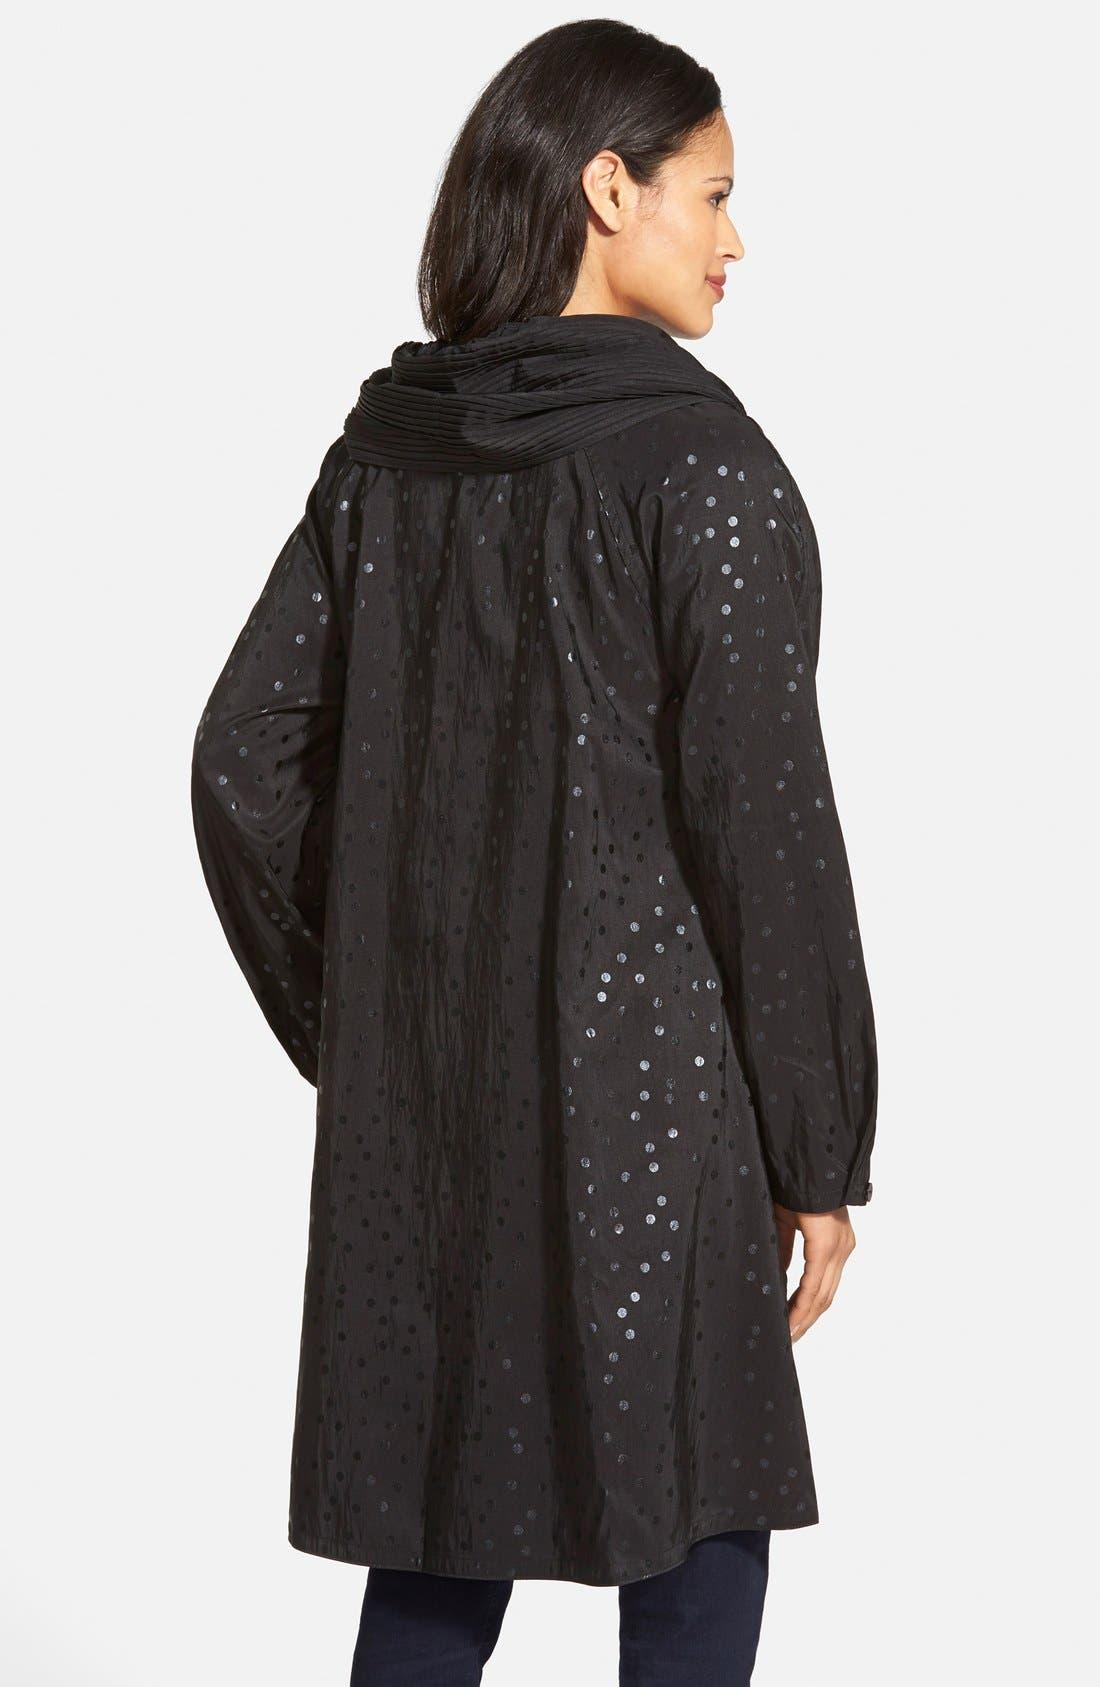 'Donatella' Reversible Dot Pleat Hood Packable Travel Coat,                             Alternate thumbnail 8, color,                             017